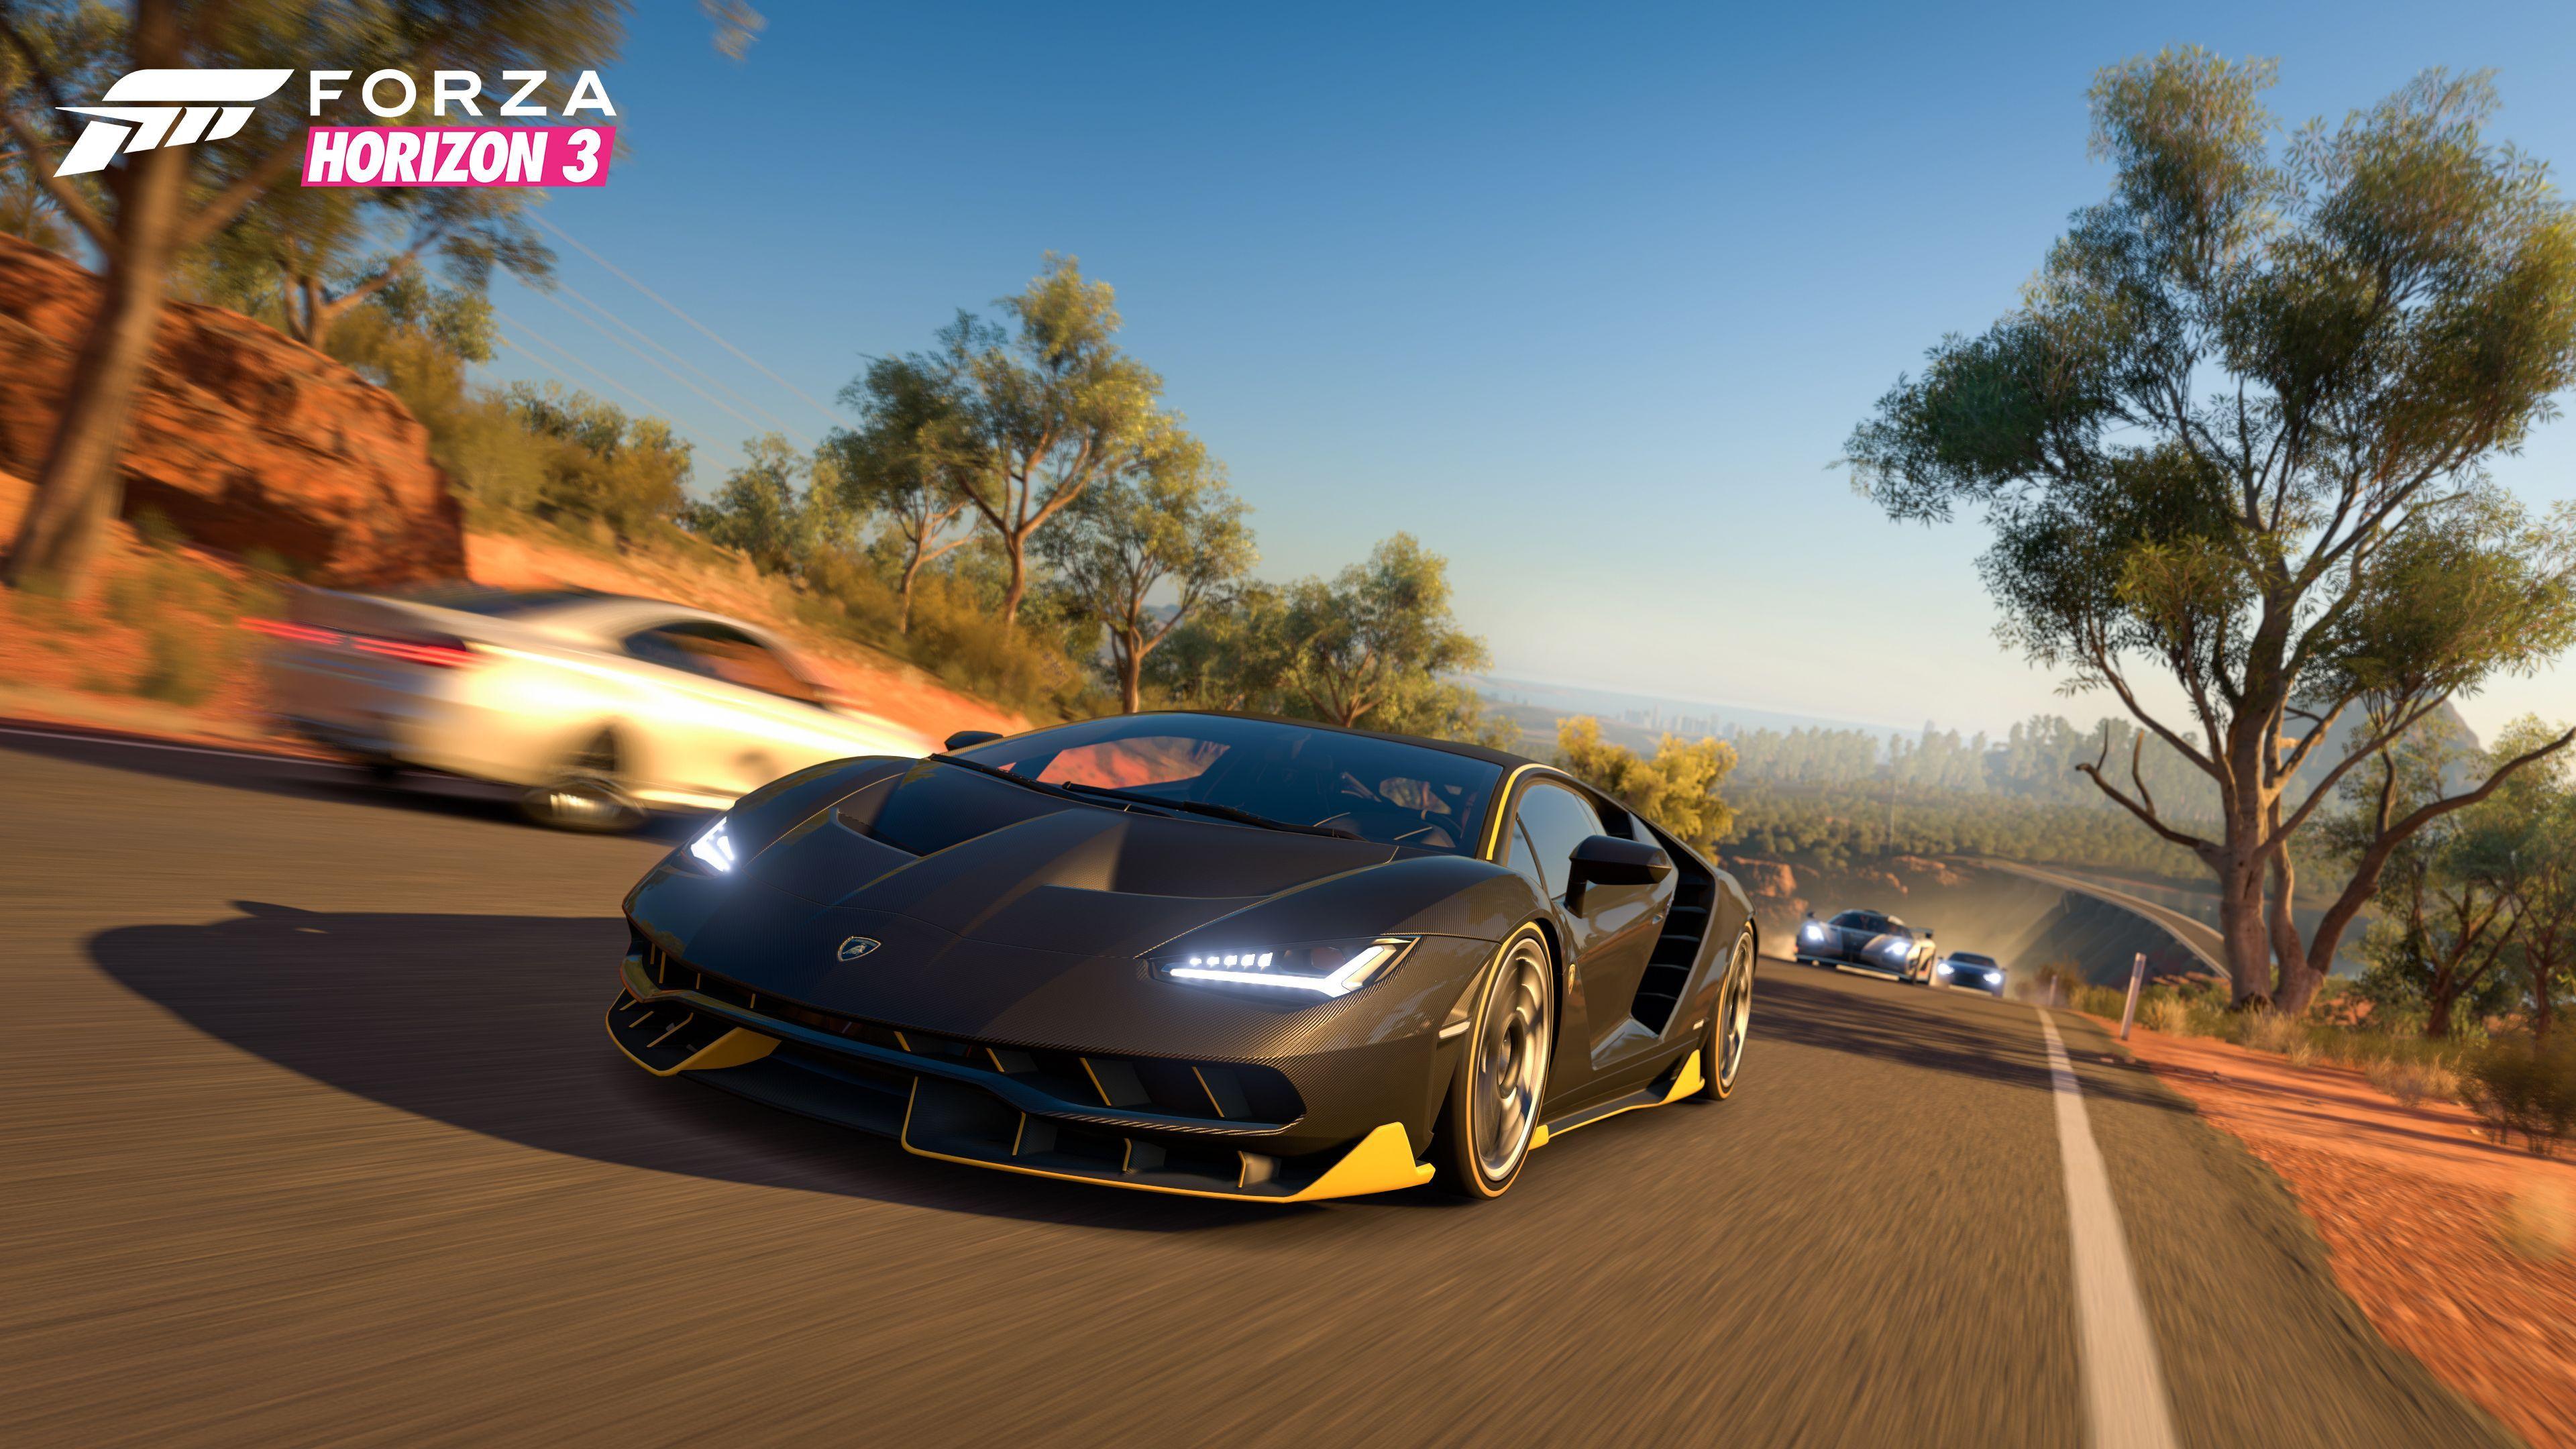 1249579ece649c5f9420f49348117ae1 Elegant Lamborghini Huracan forza Horizon 2 Cars Trend